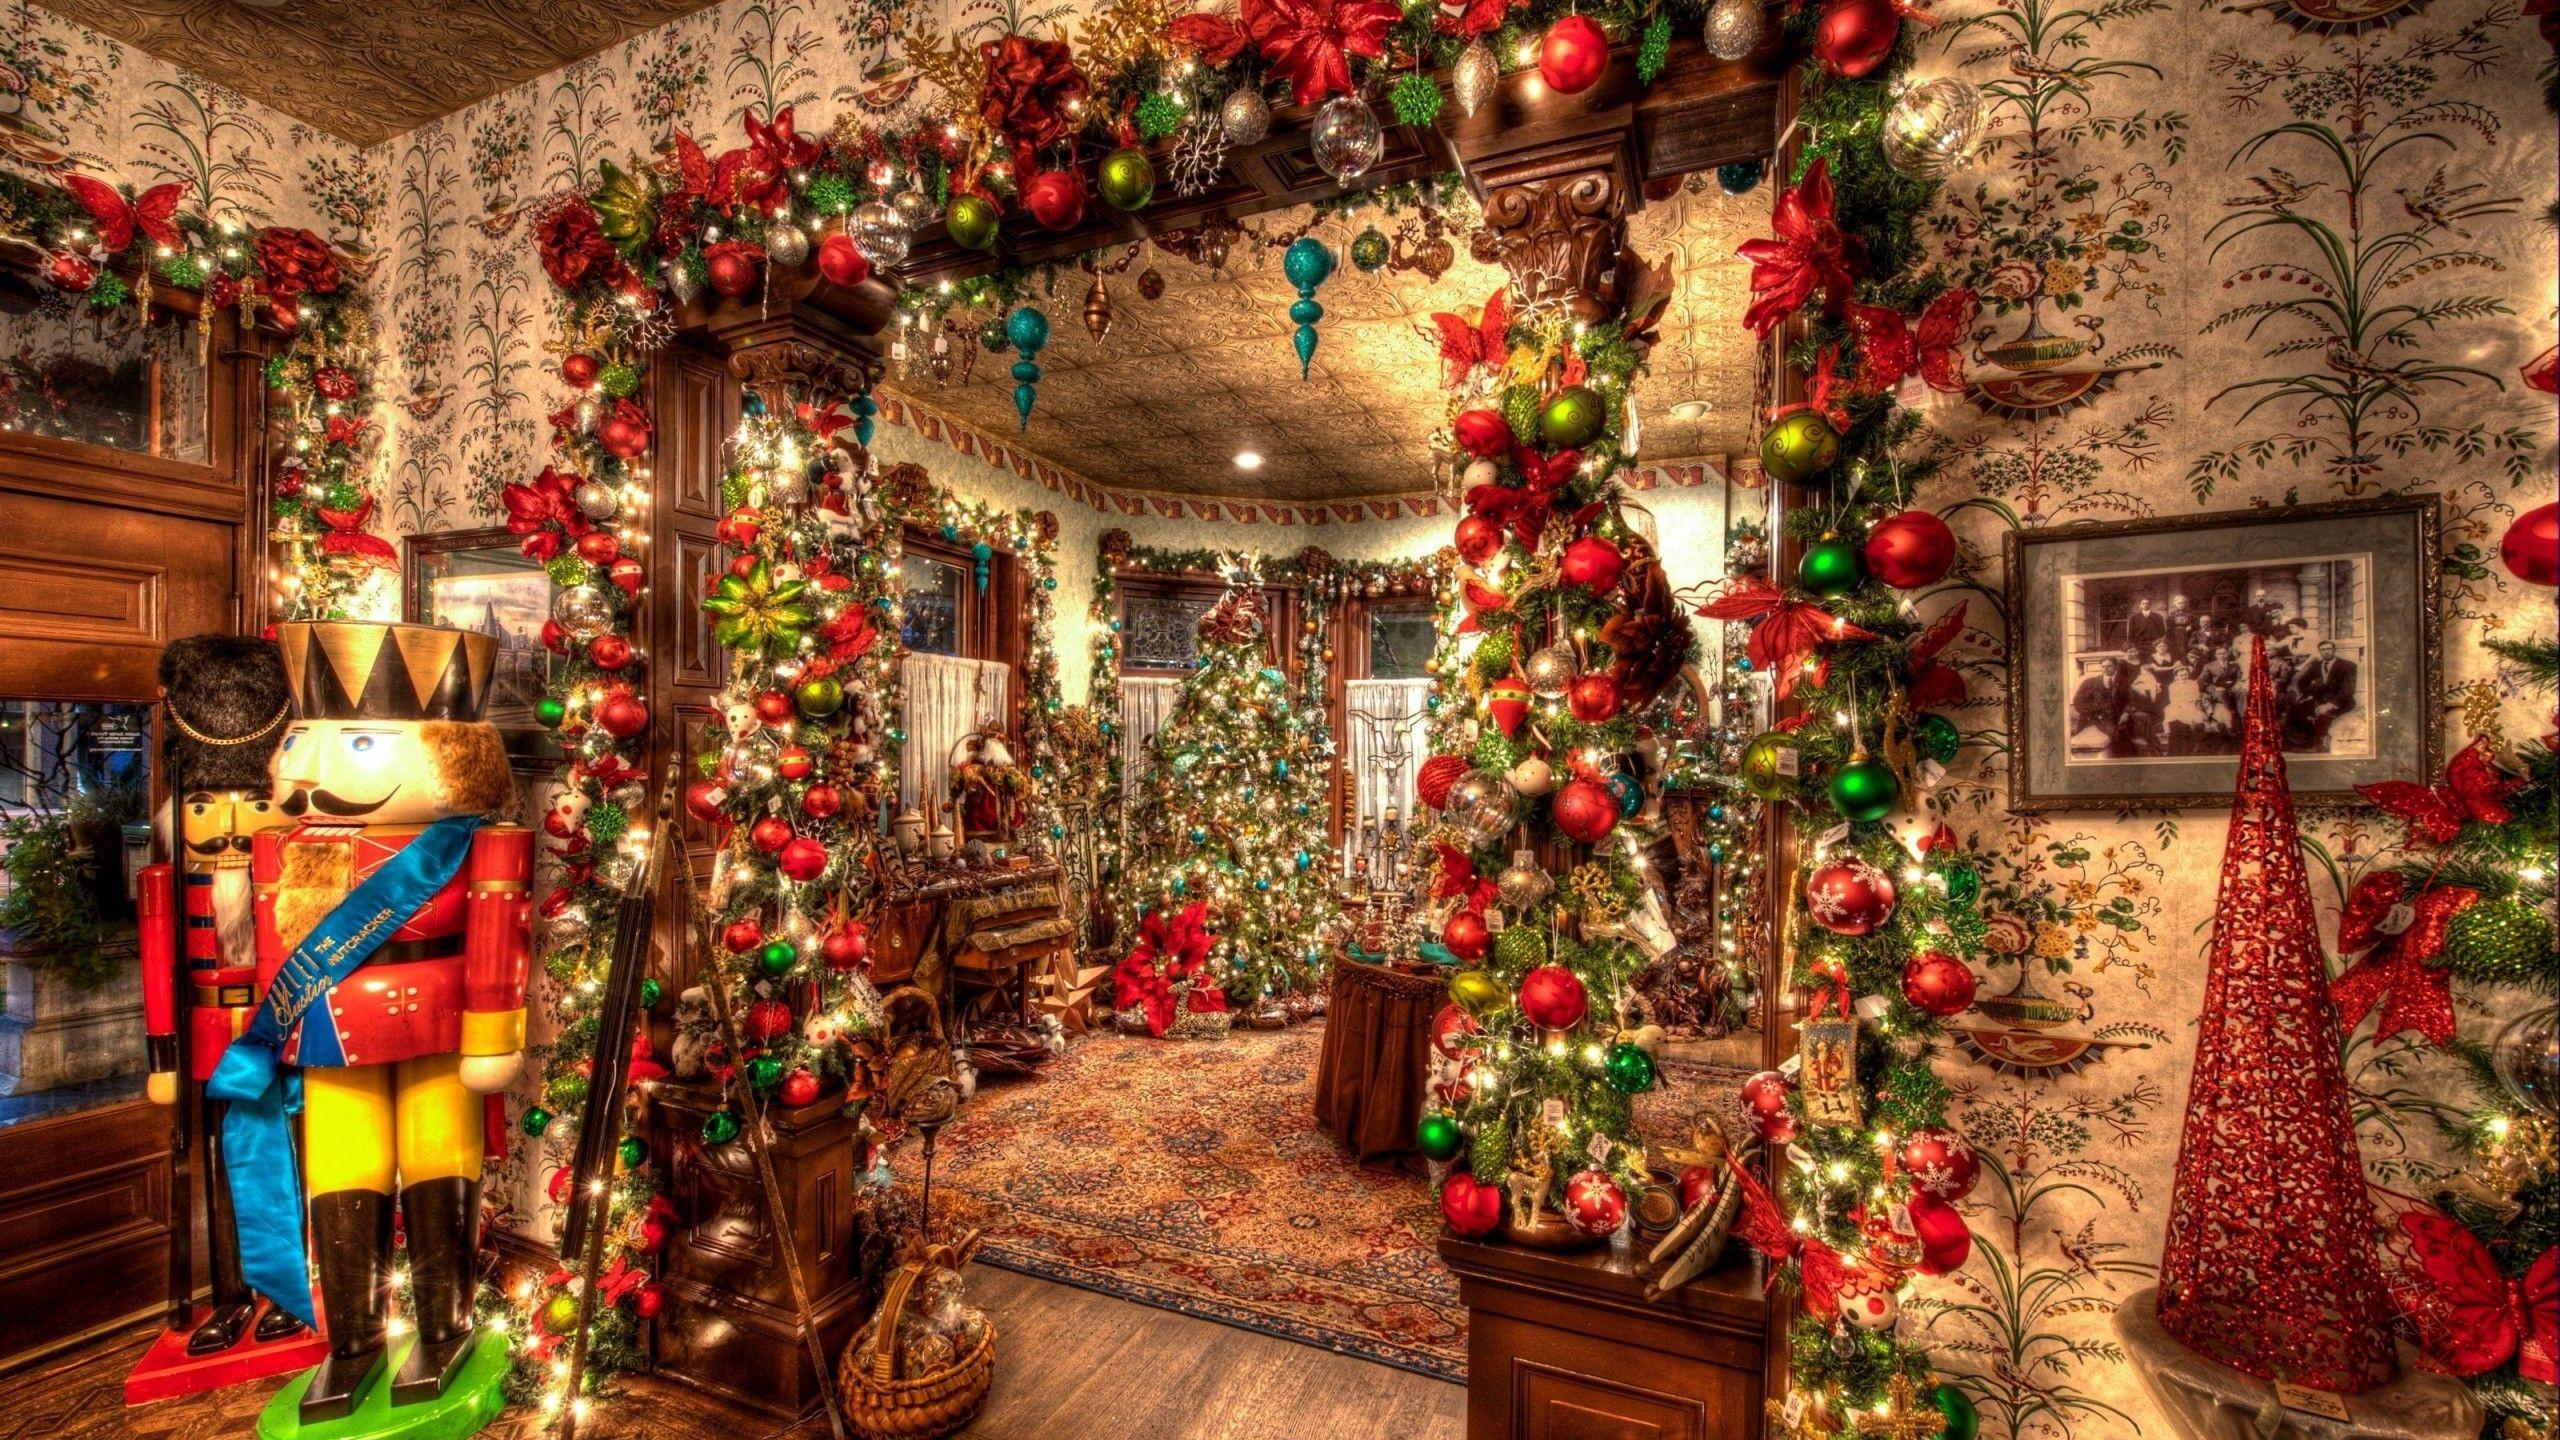 2560x1440 Christmas Tree Toys Wallpaper Christmas Decorations For The Home Christmas Wallpaper Christmas House Decorations Inside